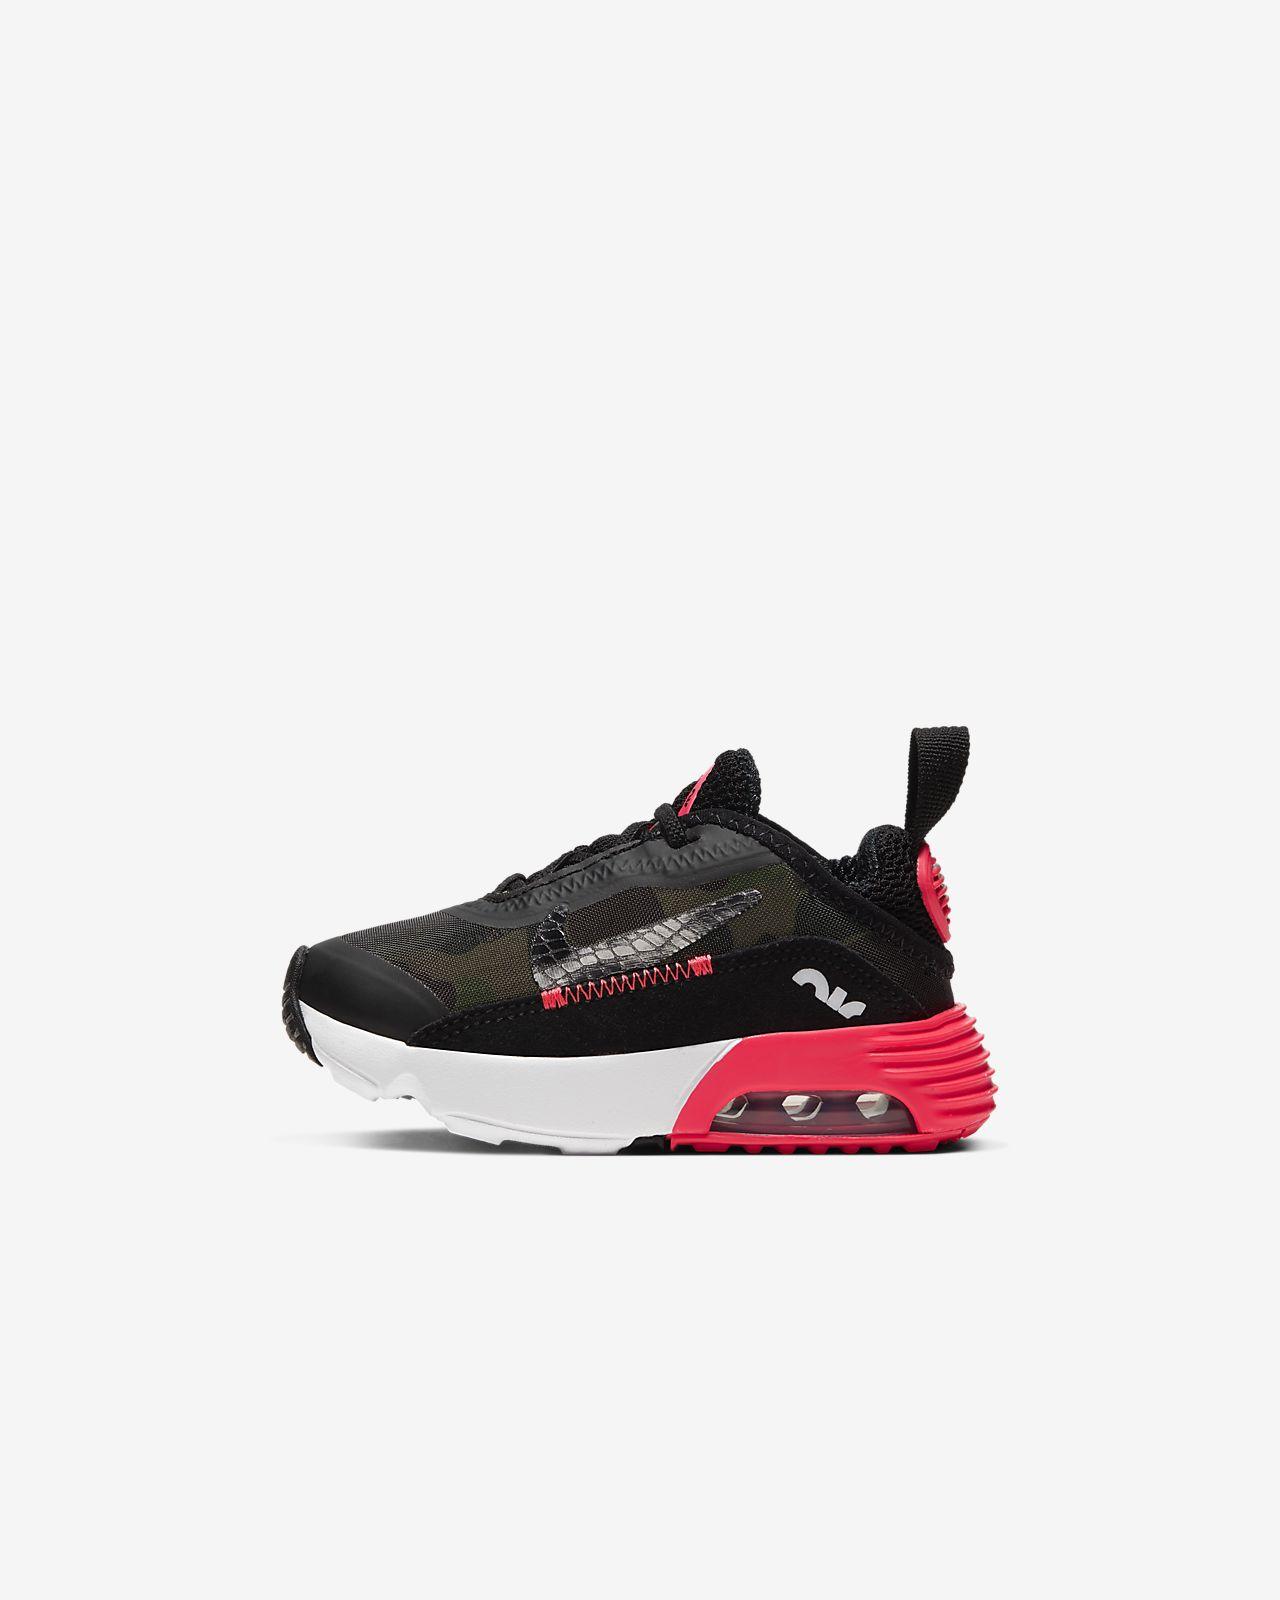 Nike Air Max 2090 SP Baby/Toddler Shoe